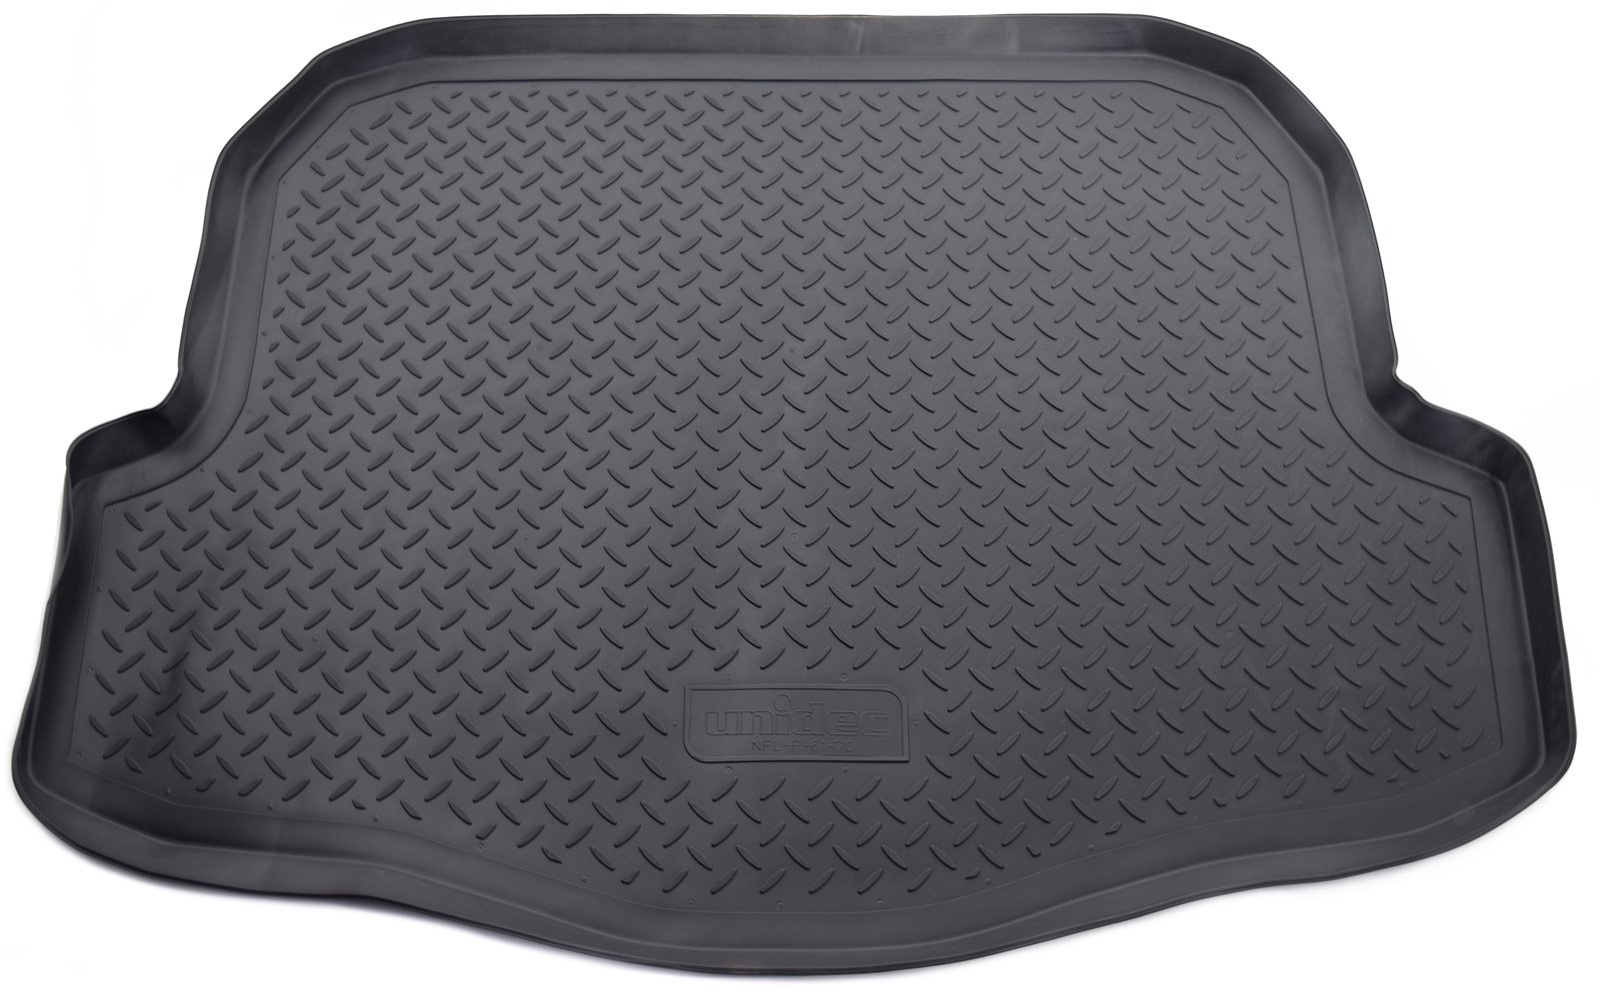 Коврик для багажника Norplast для Nissan Teana, SD, 2003-2008, NPL-P-61-70, черный